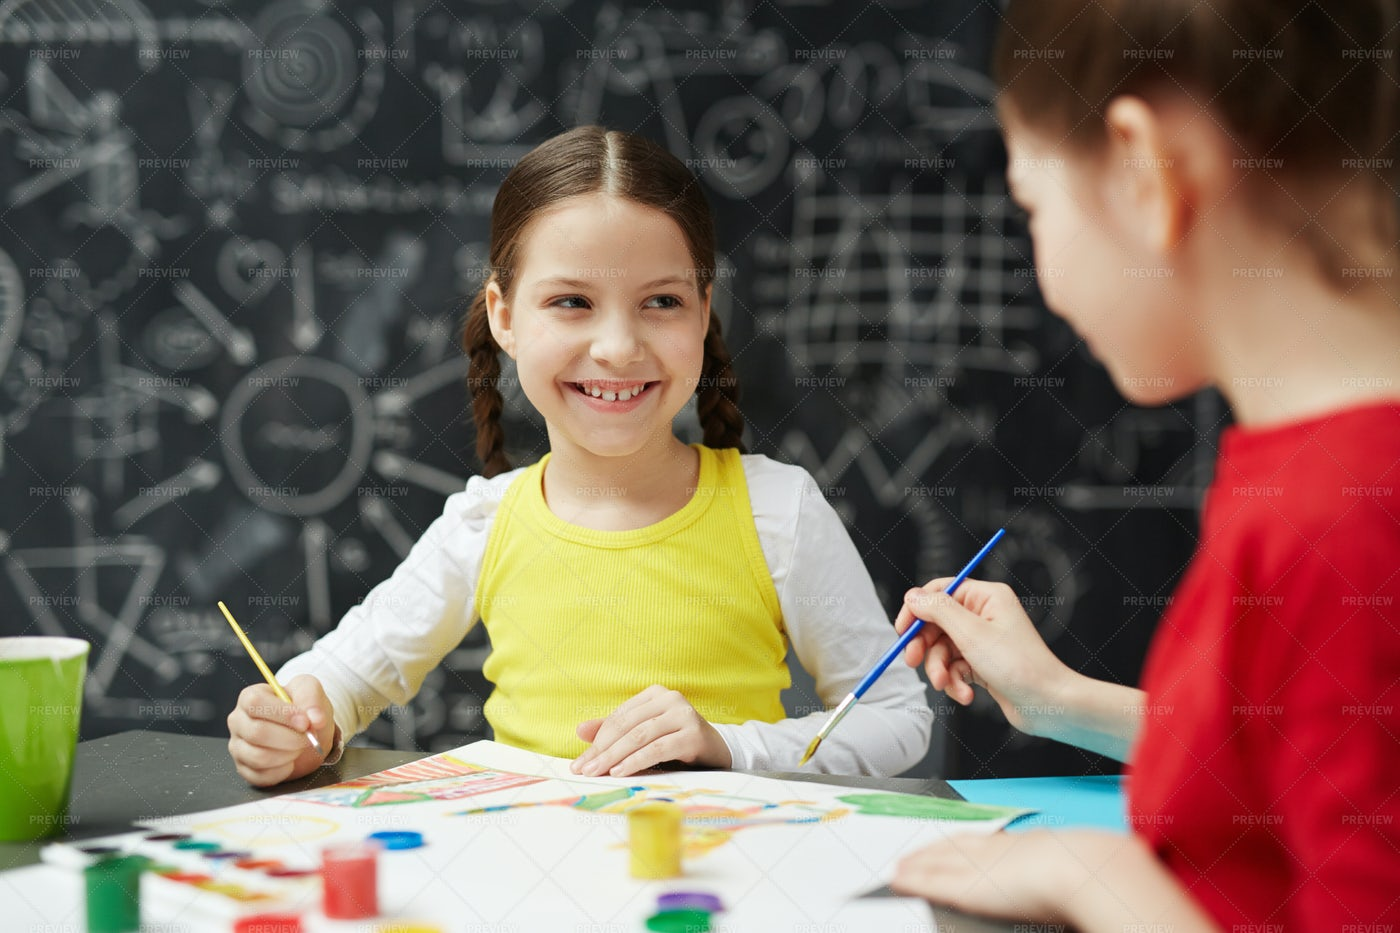 Cute Girl Painting In Art Class: Stock Photos